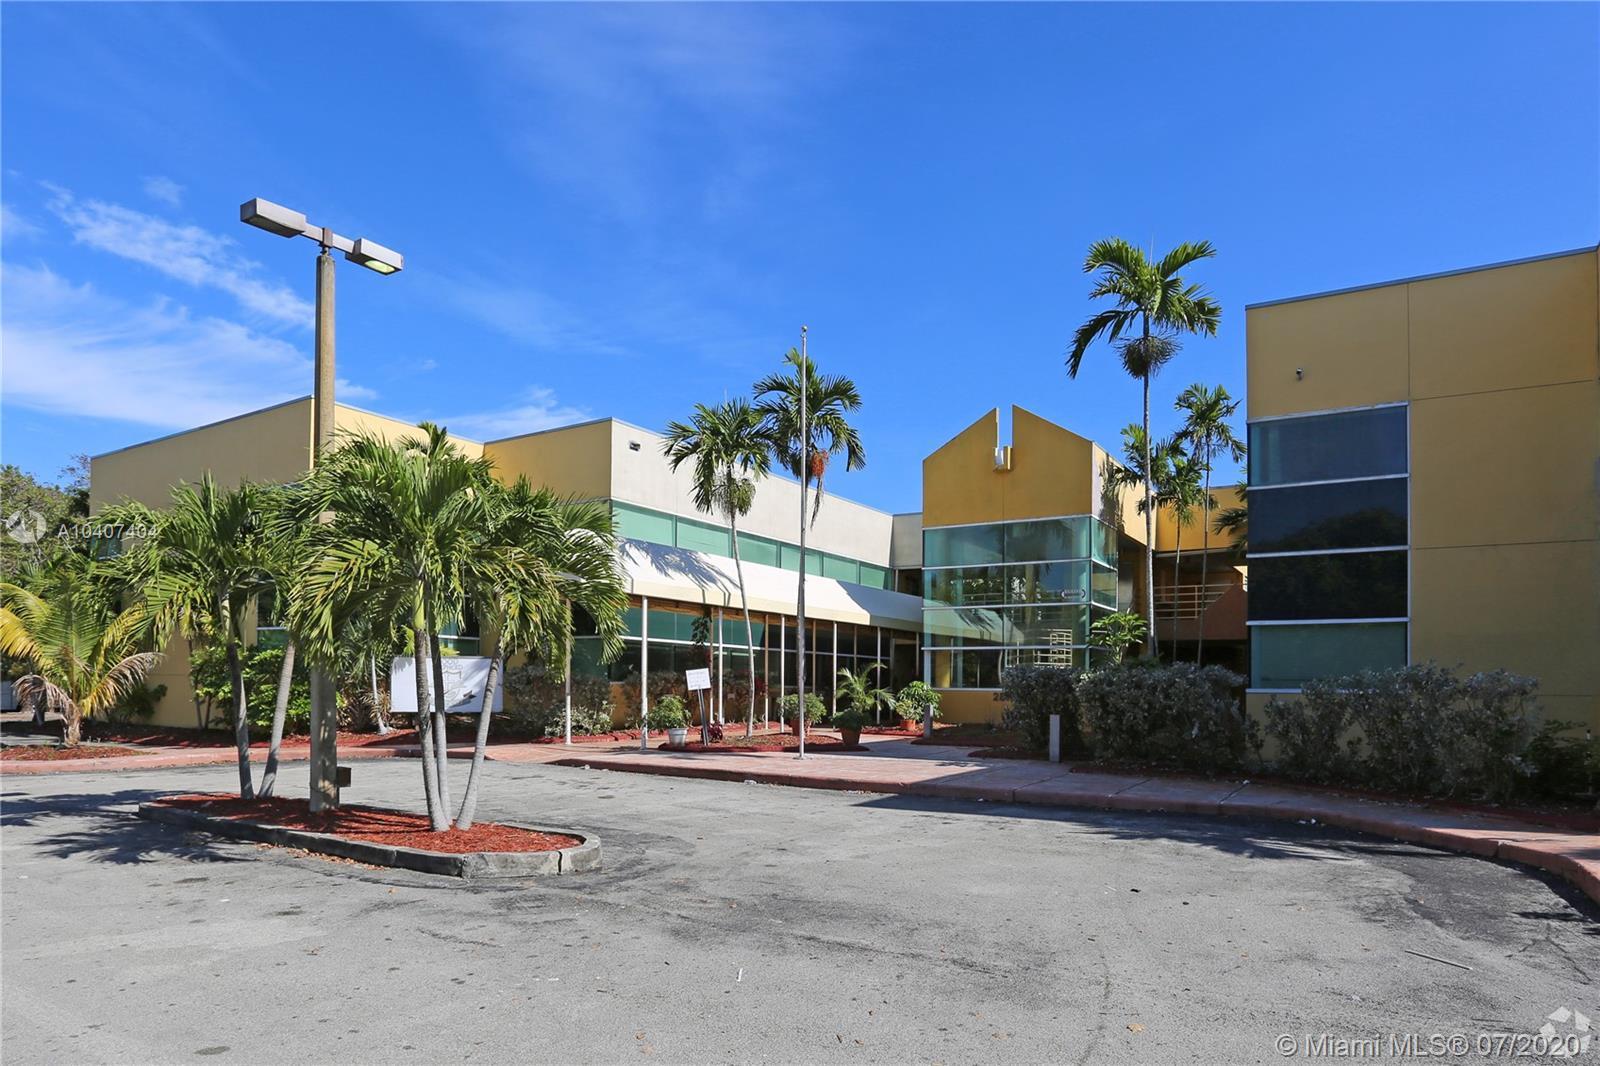 275-295 NW 199th St, Miami Gardens, FL 33169